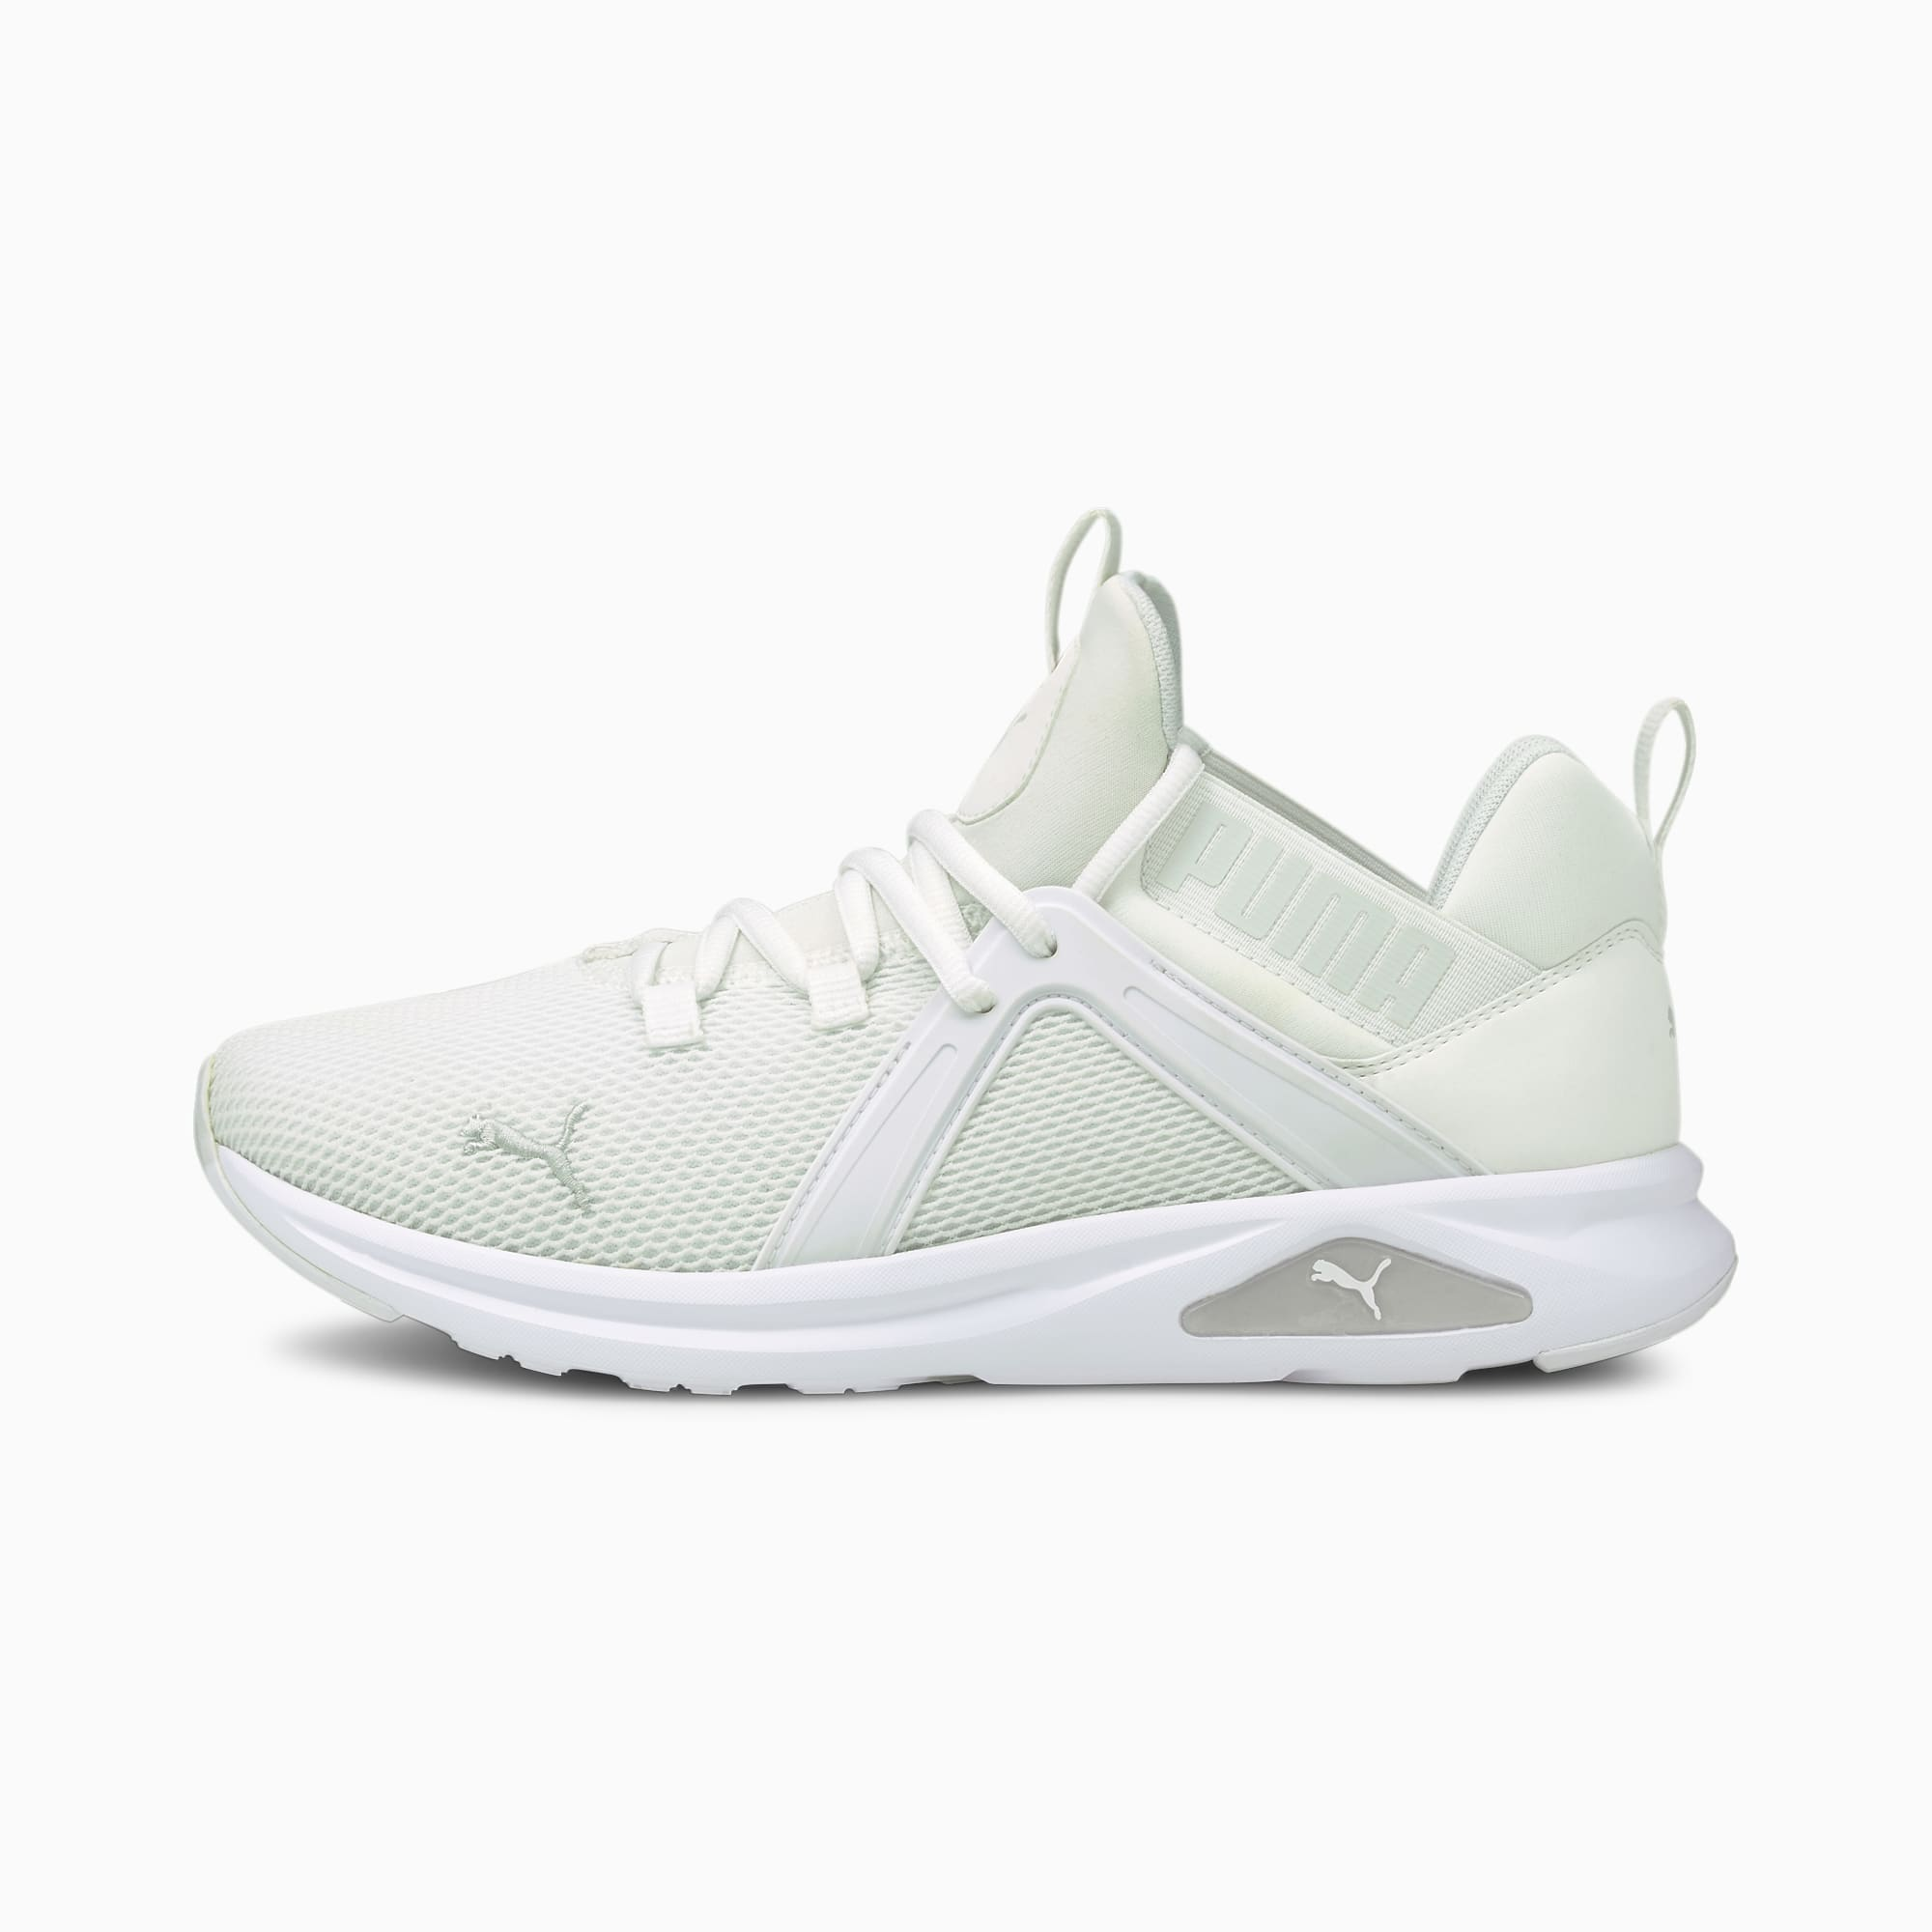 Enzo 2 Men's Running Shoes